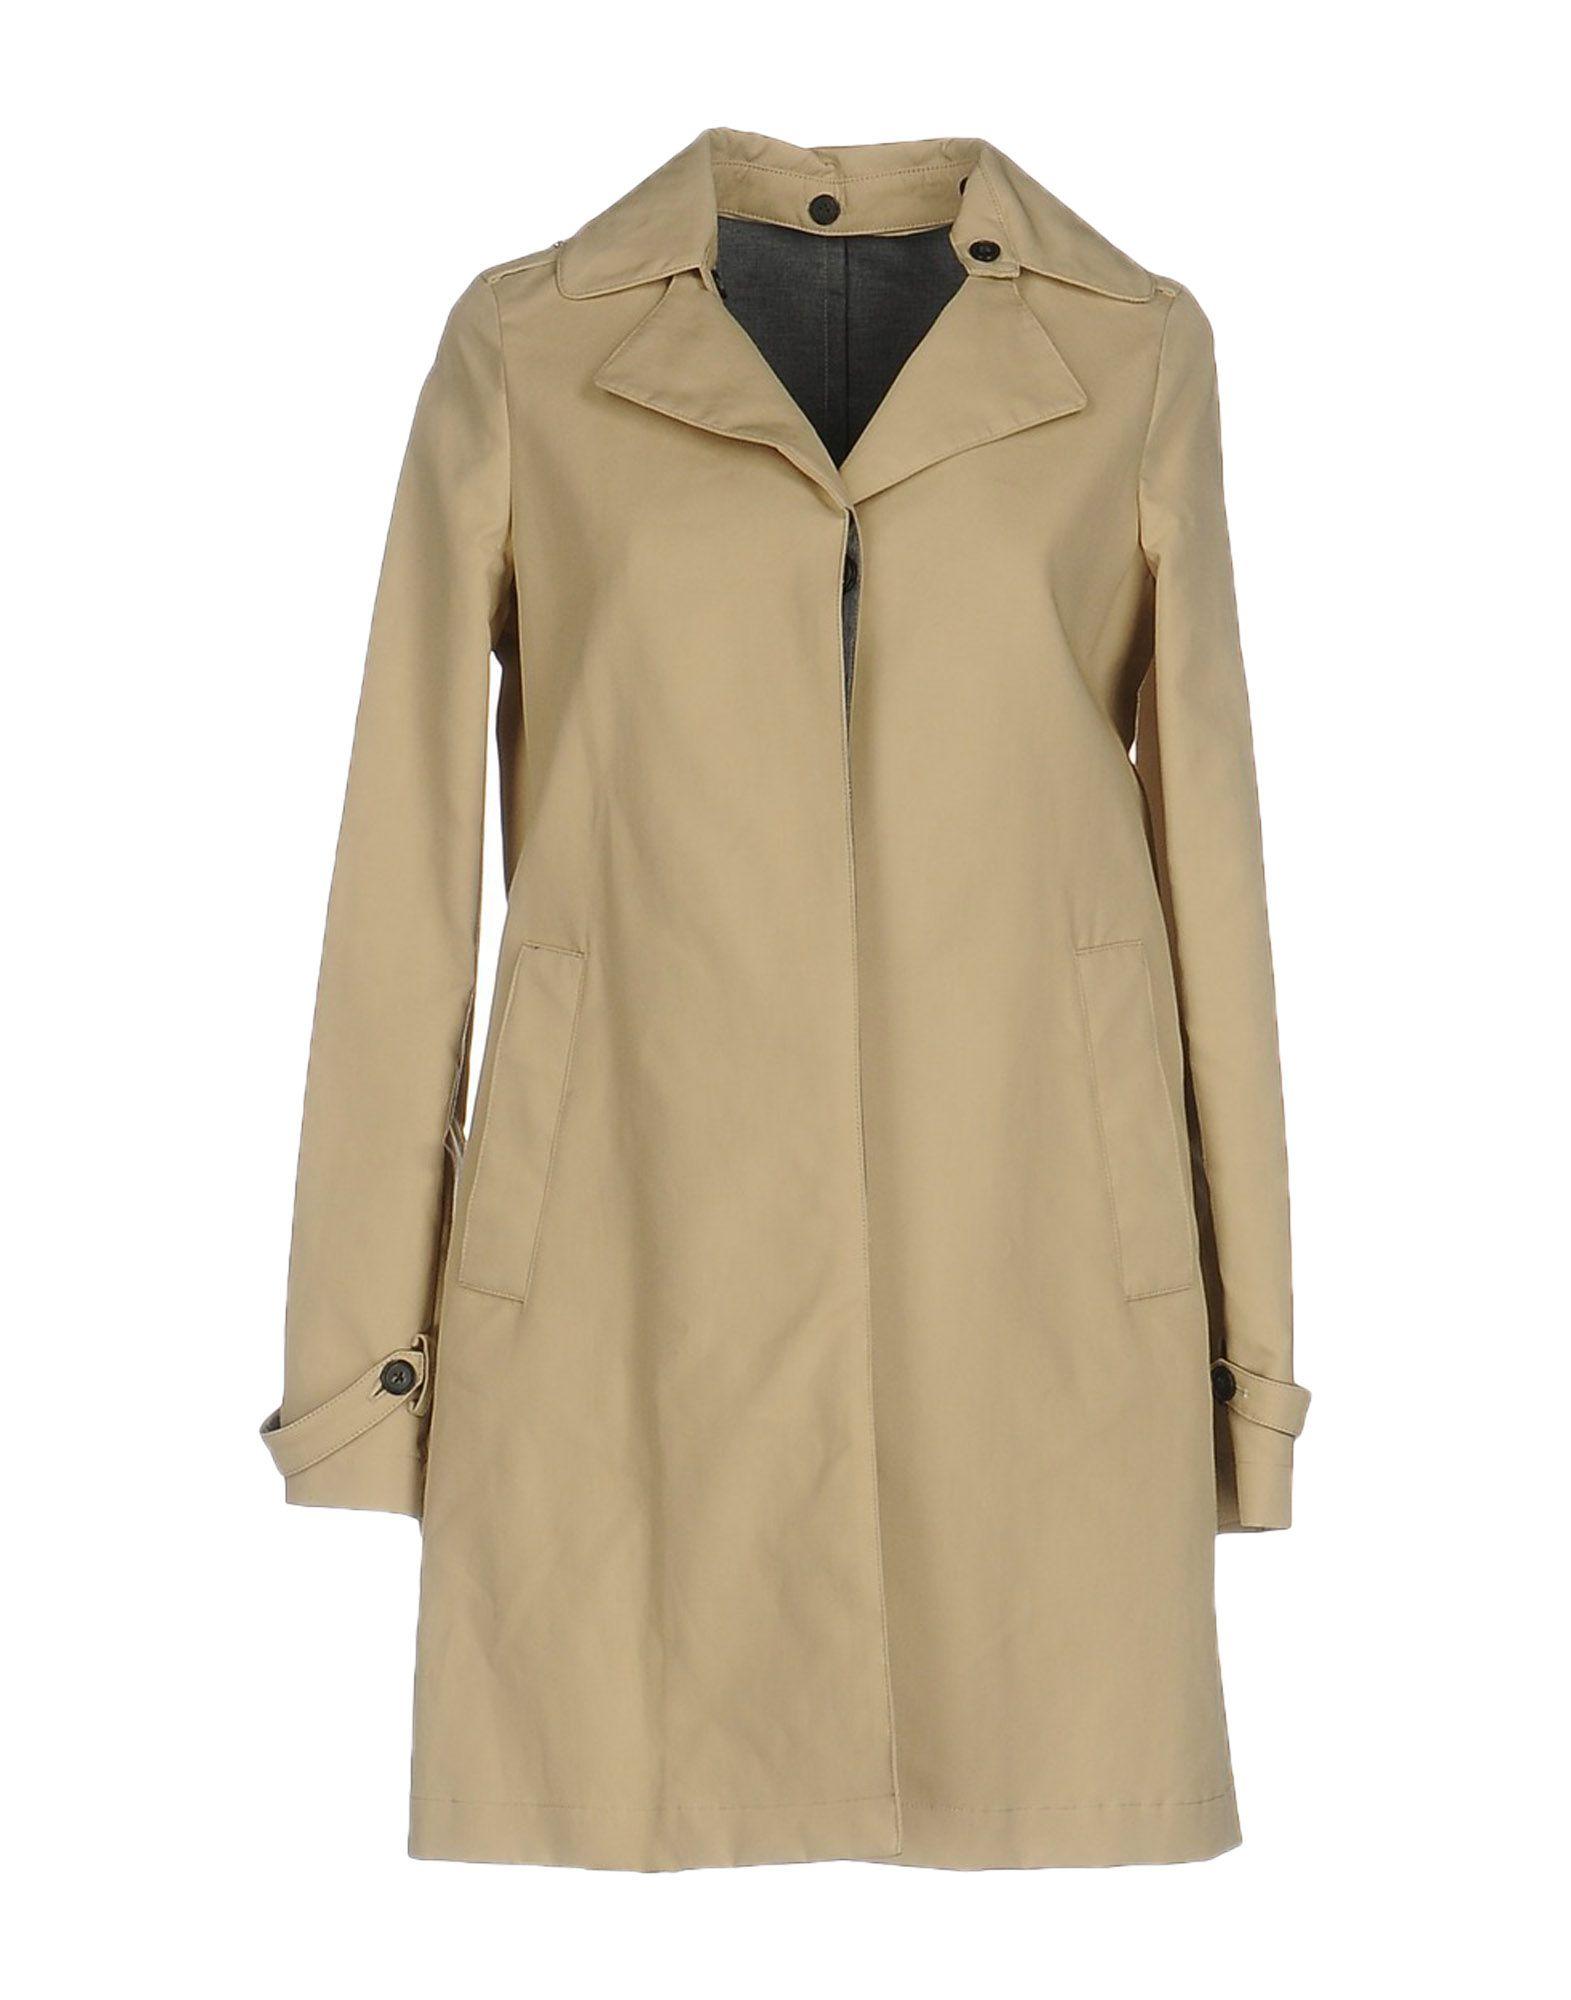 GOLDEN GOOSE DELUXE BRAND Легкое пальто golden goose deluxe brand джинсы с клетчатой деталью